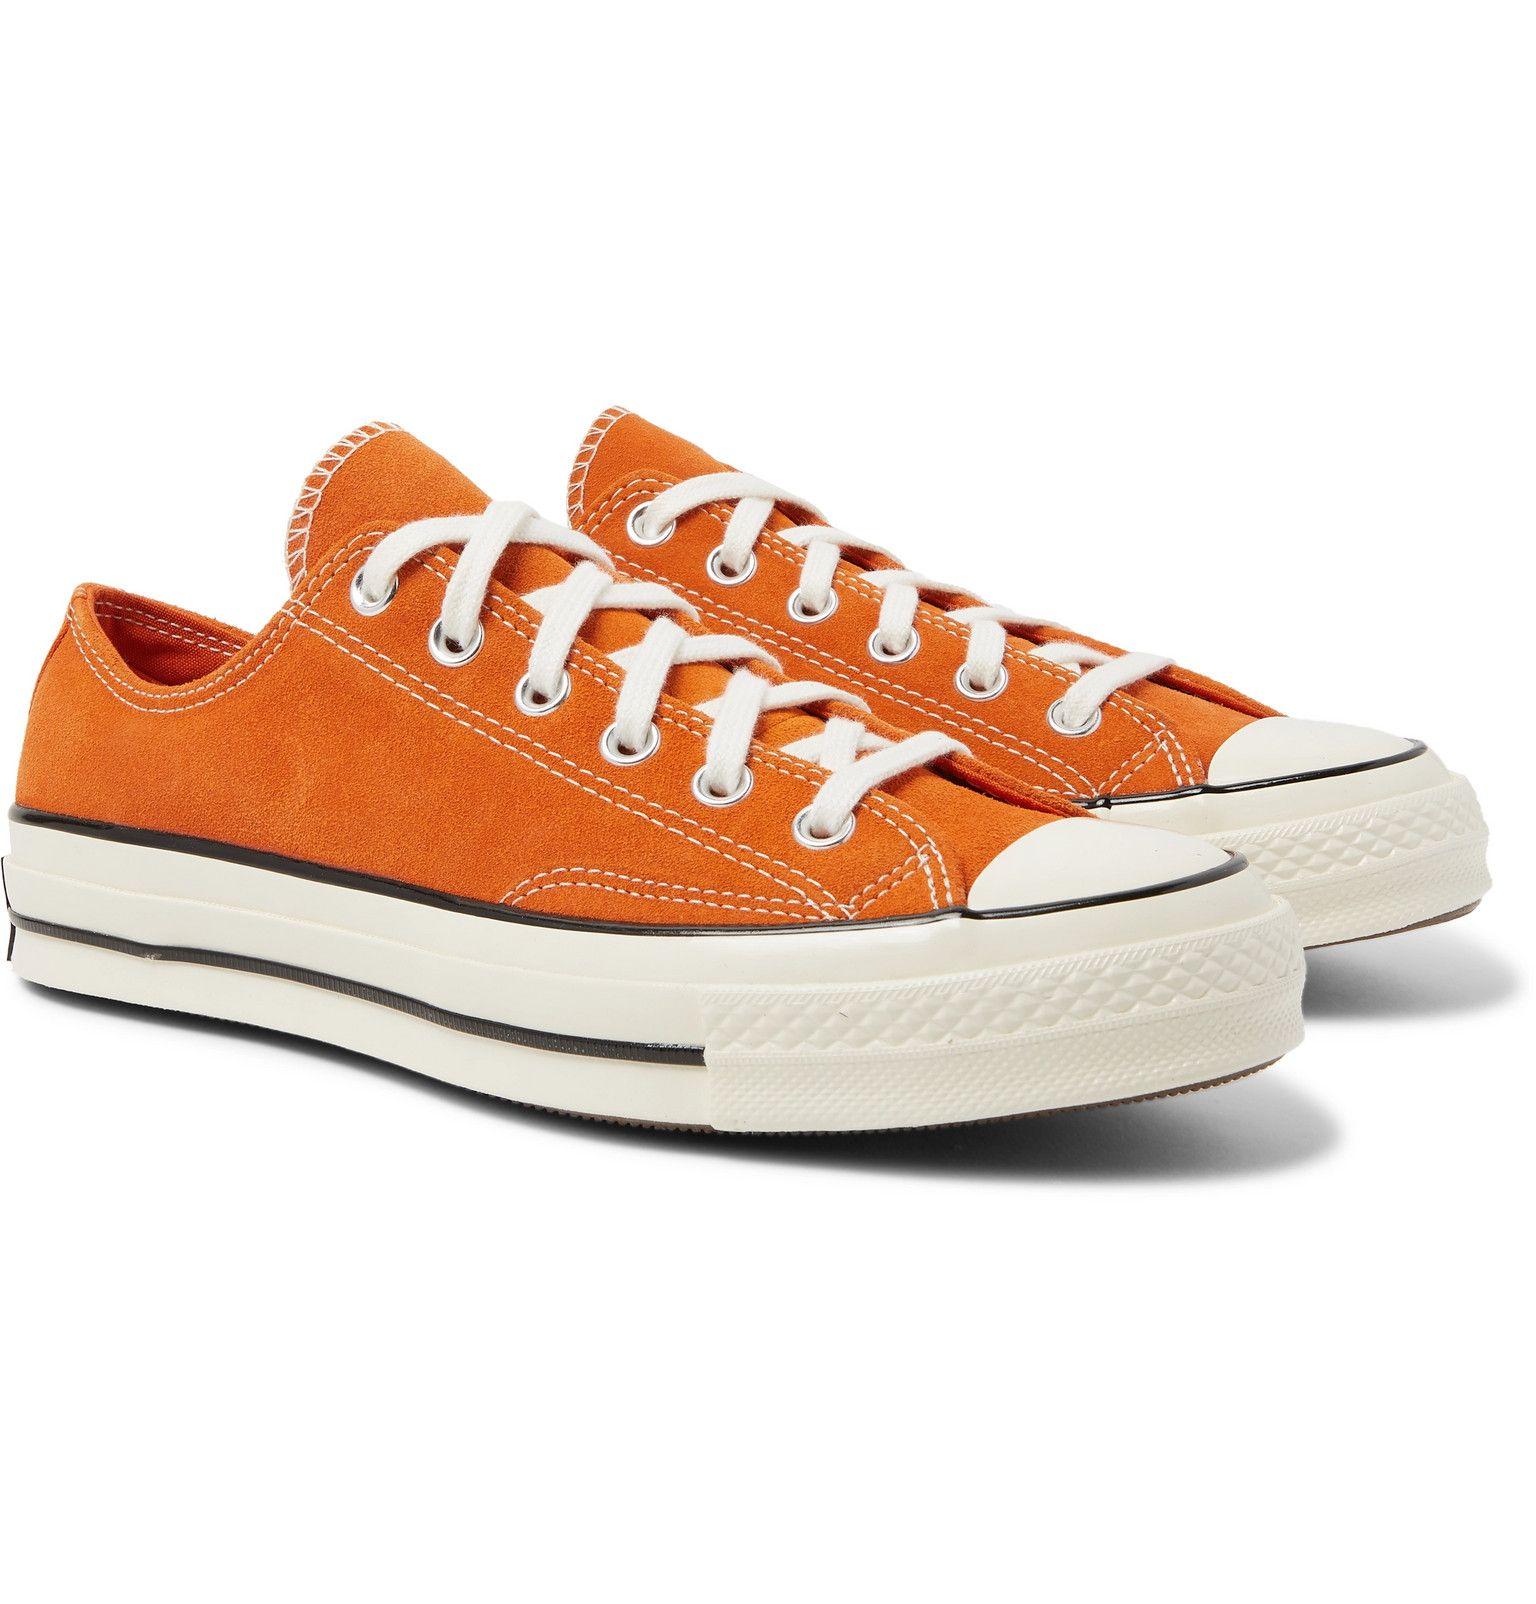 Orange Chuck 70 Suede Sneakers